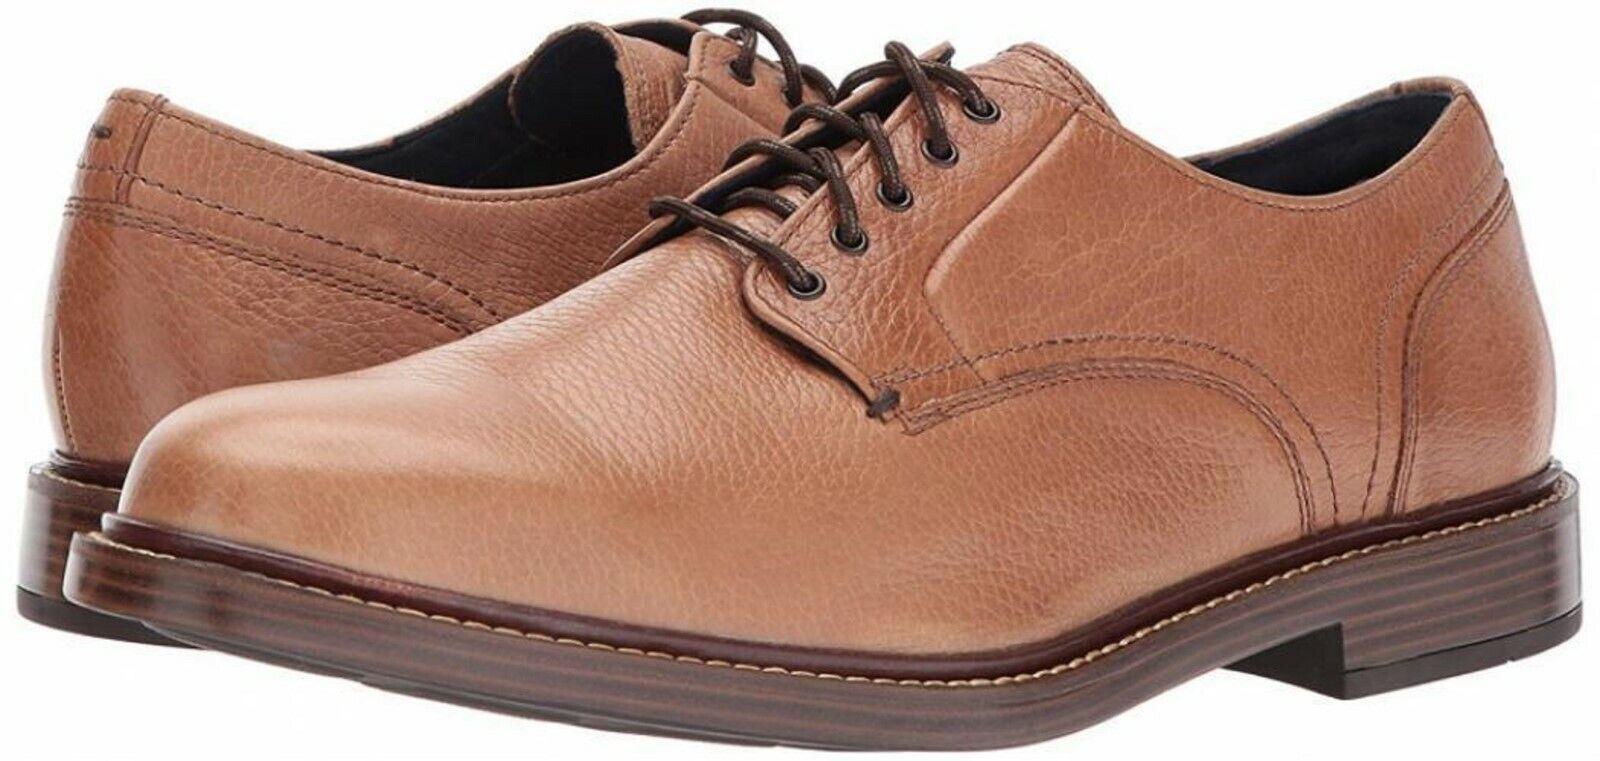 Cole Homme Haan Adams Grand Plain Oxford Chaussures en cuir boisbury 10 nouveau in Box